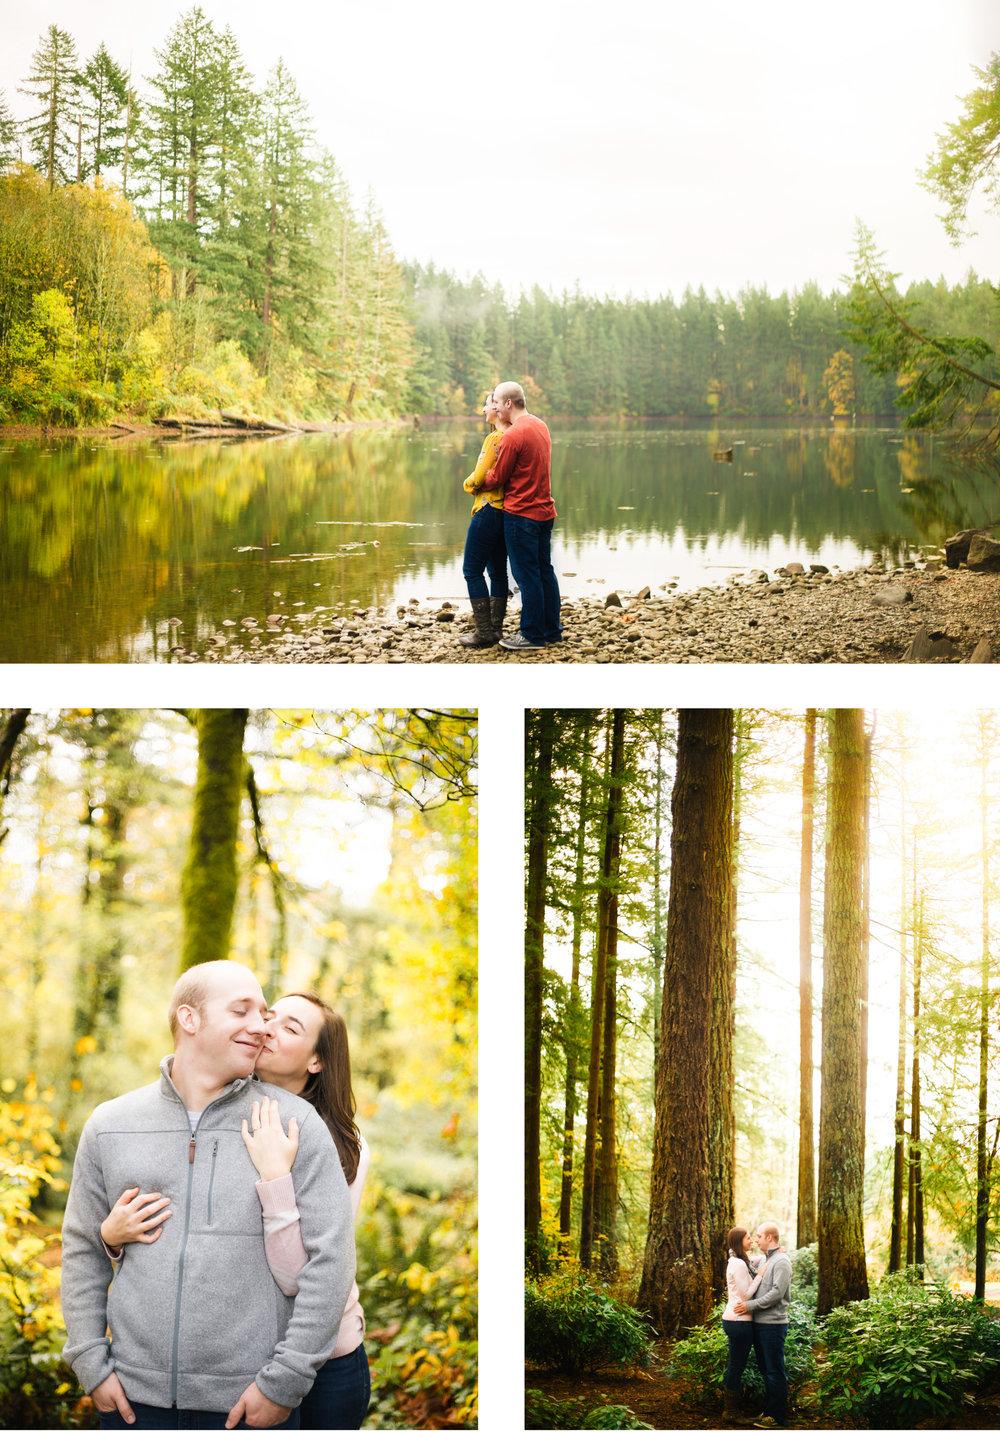 Portland_Oregon_Engagement_Photographer_1-2.jpg